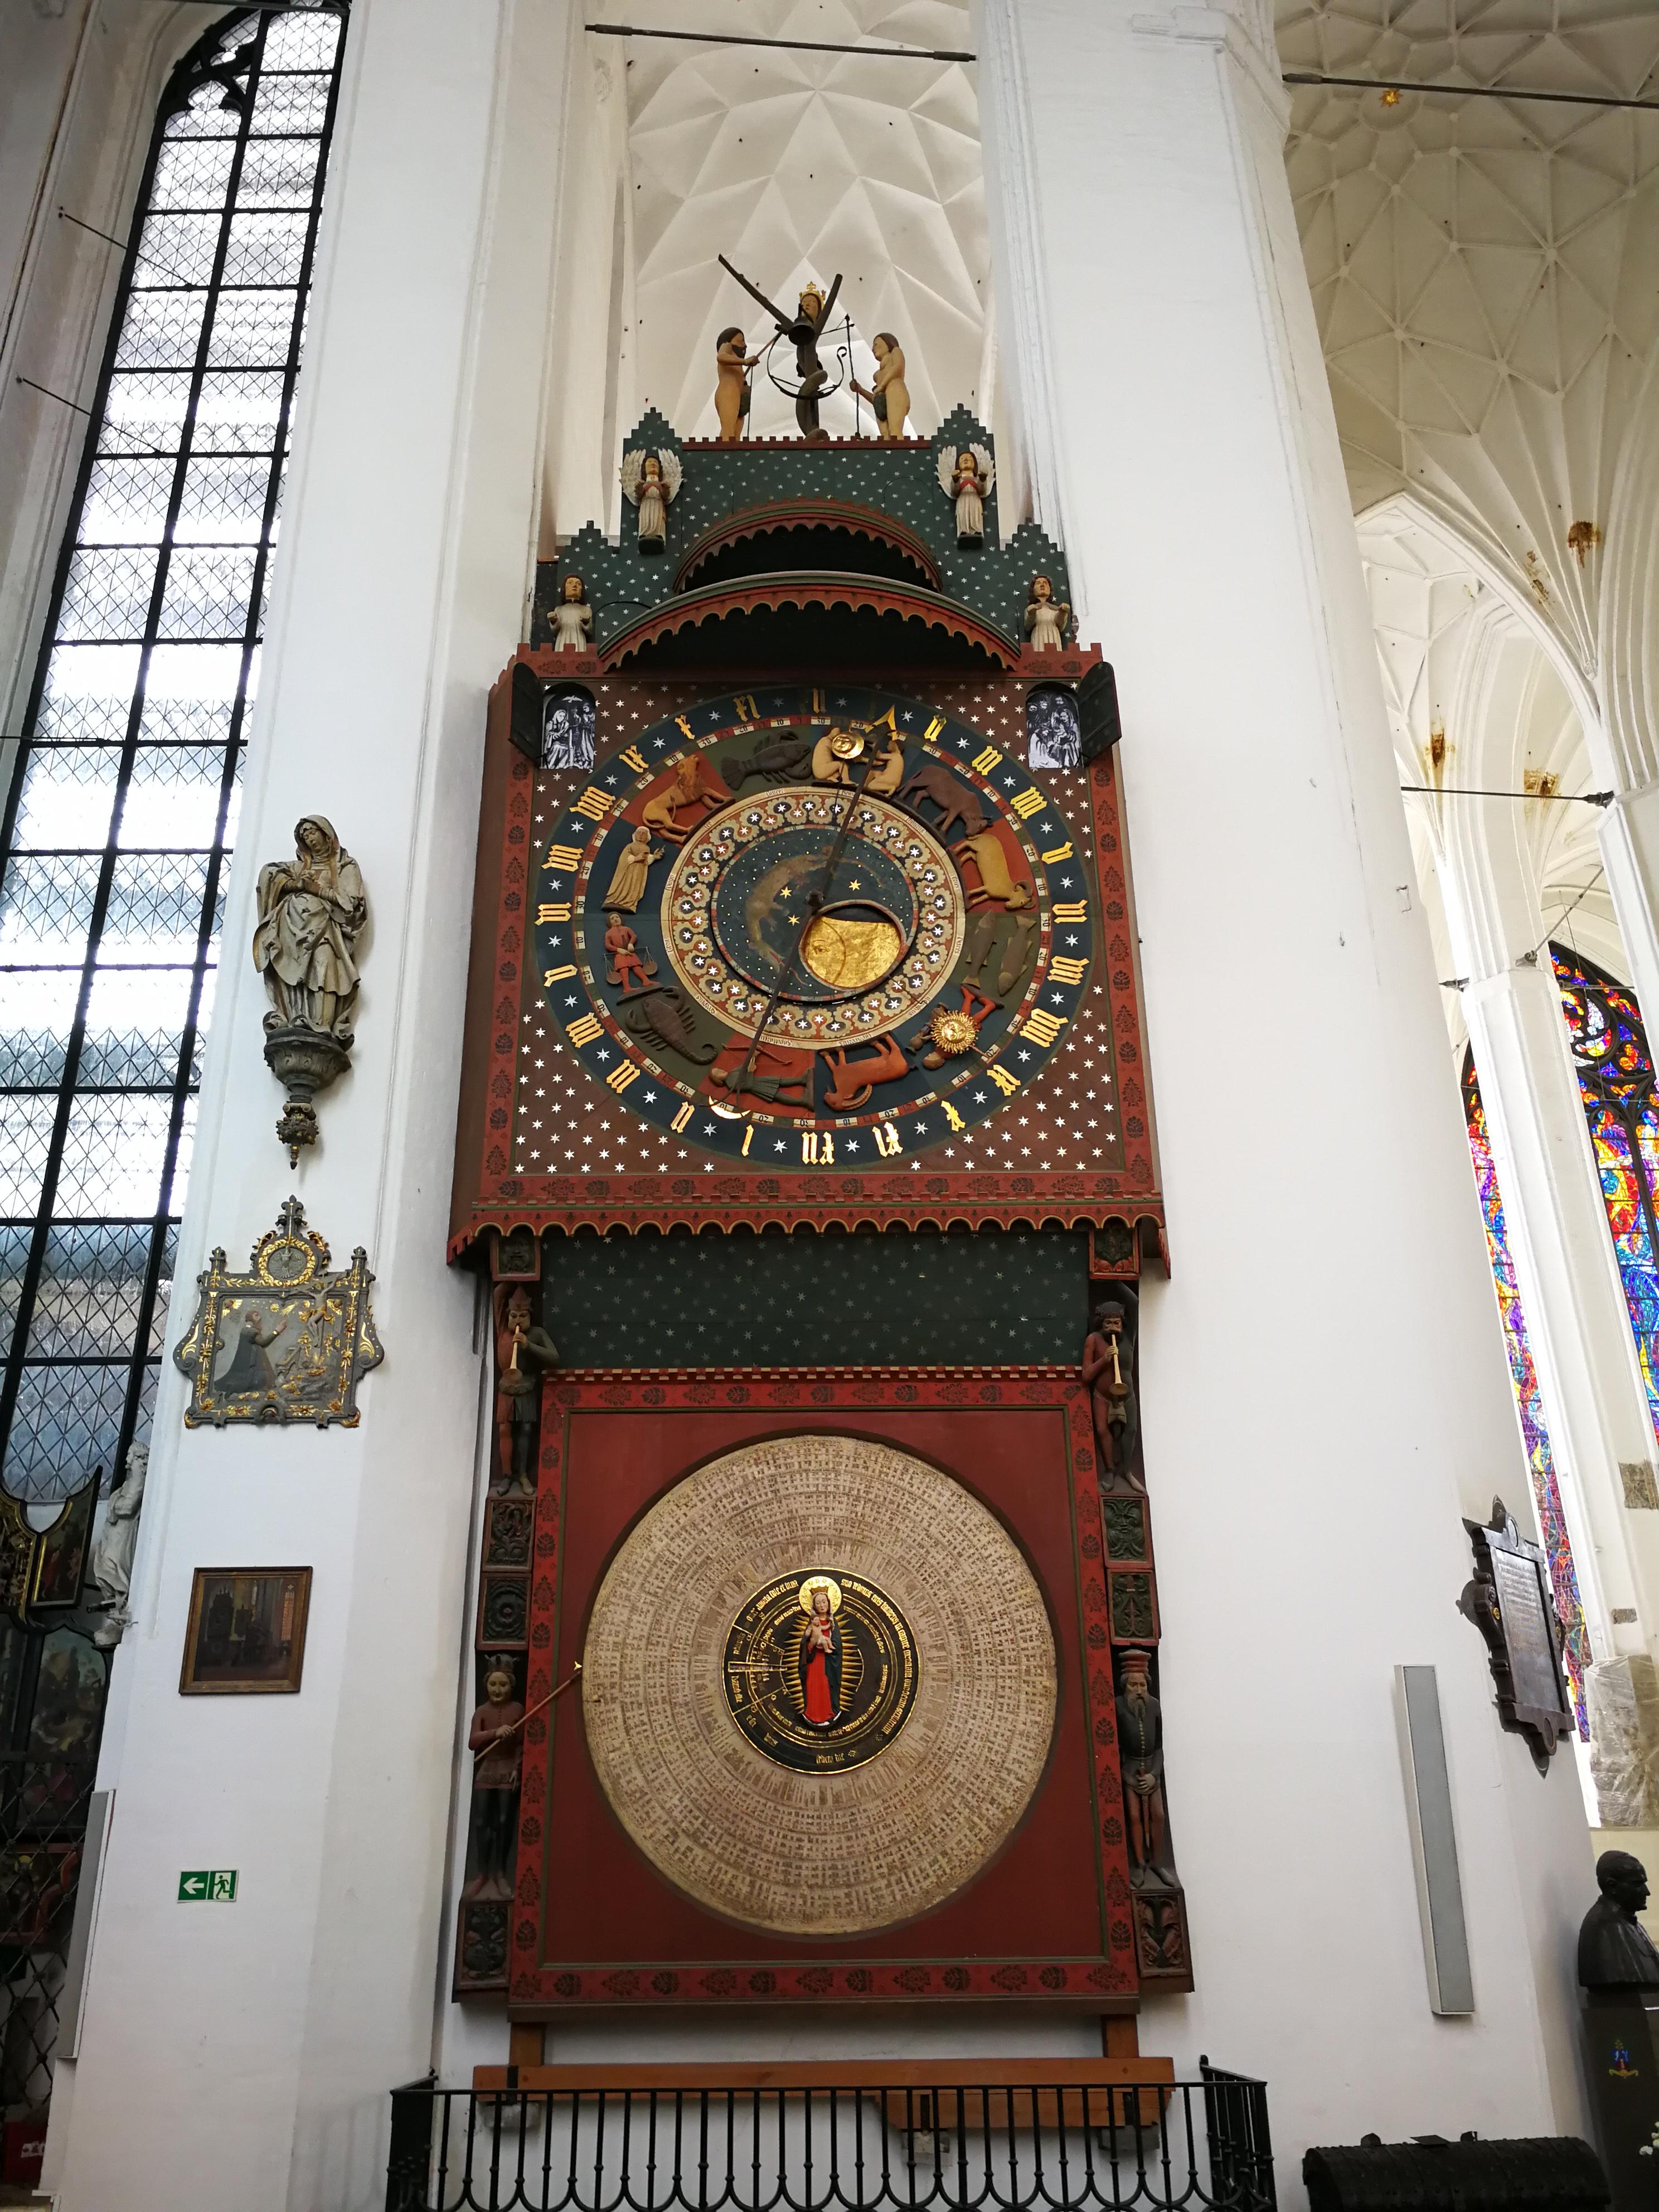 Basiliek van de Heilige Maagd Maria, Gdansk. Astronomische klok. Ania Anna Kotula. www.gidsingdansk.nl